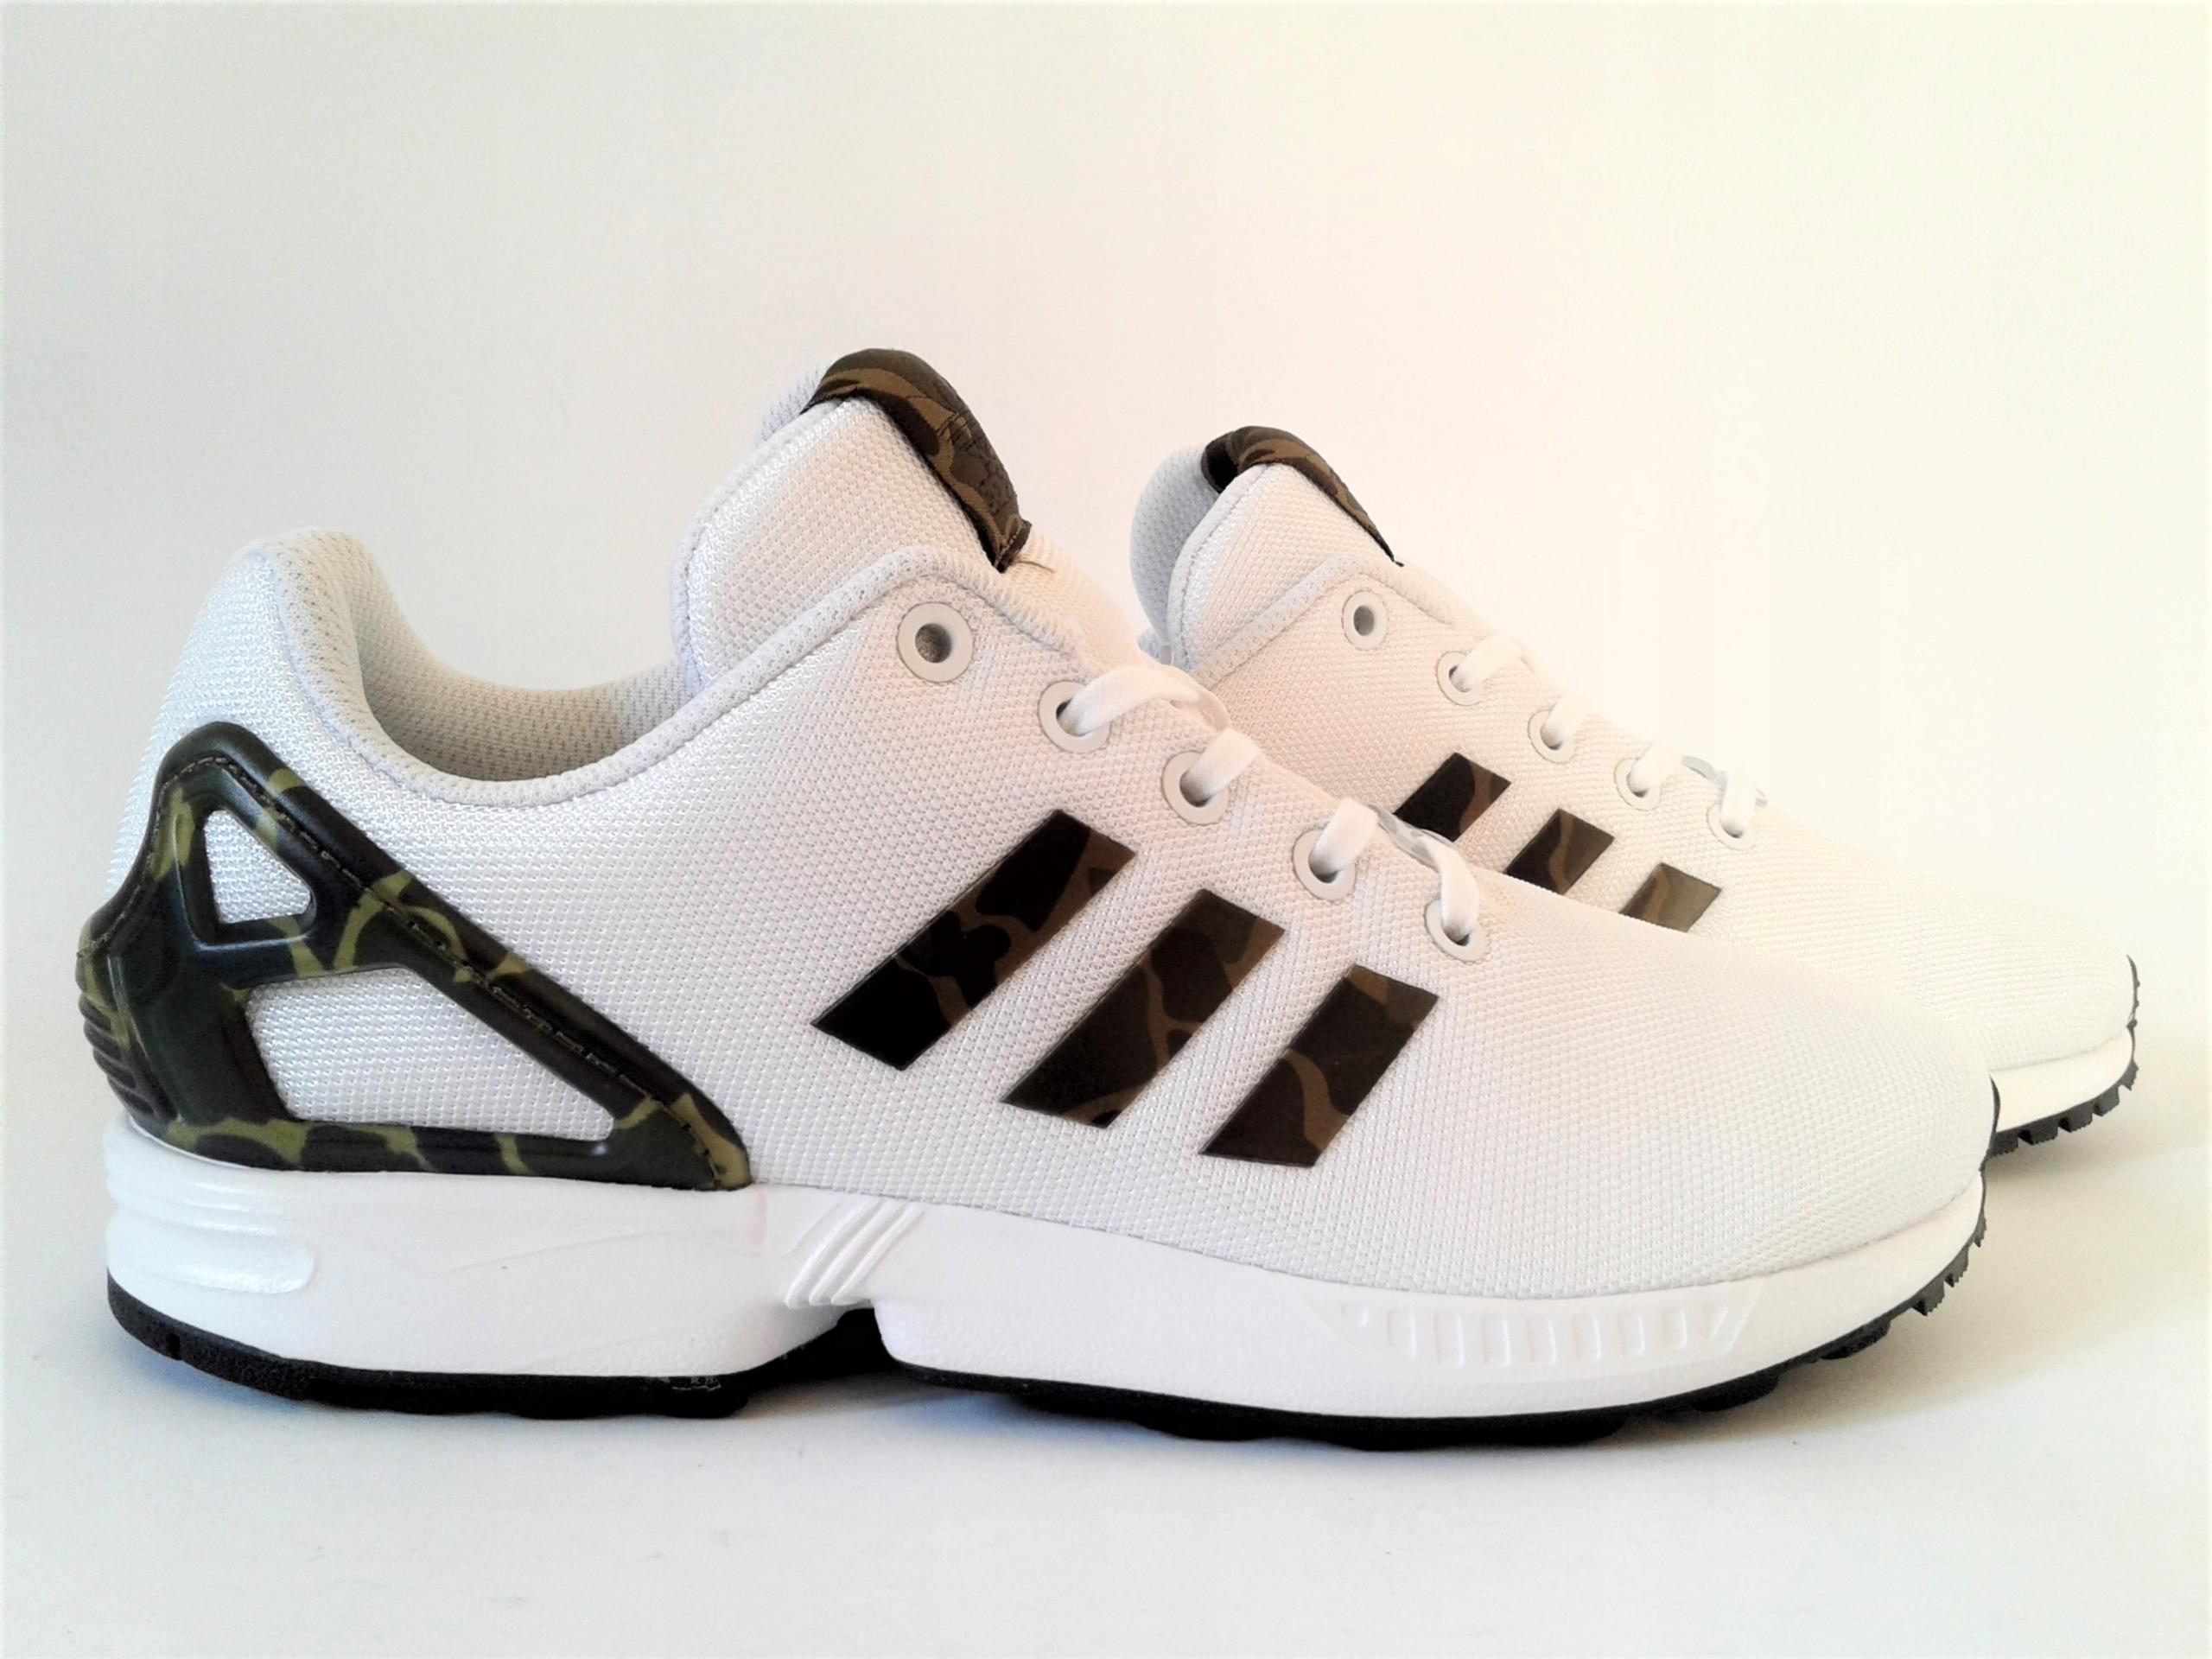 052ac422 Buty Adidas Zx Flux moro junior r.39 1/3 (25 cm) 7513344652 - Allegro.pl